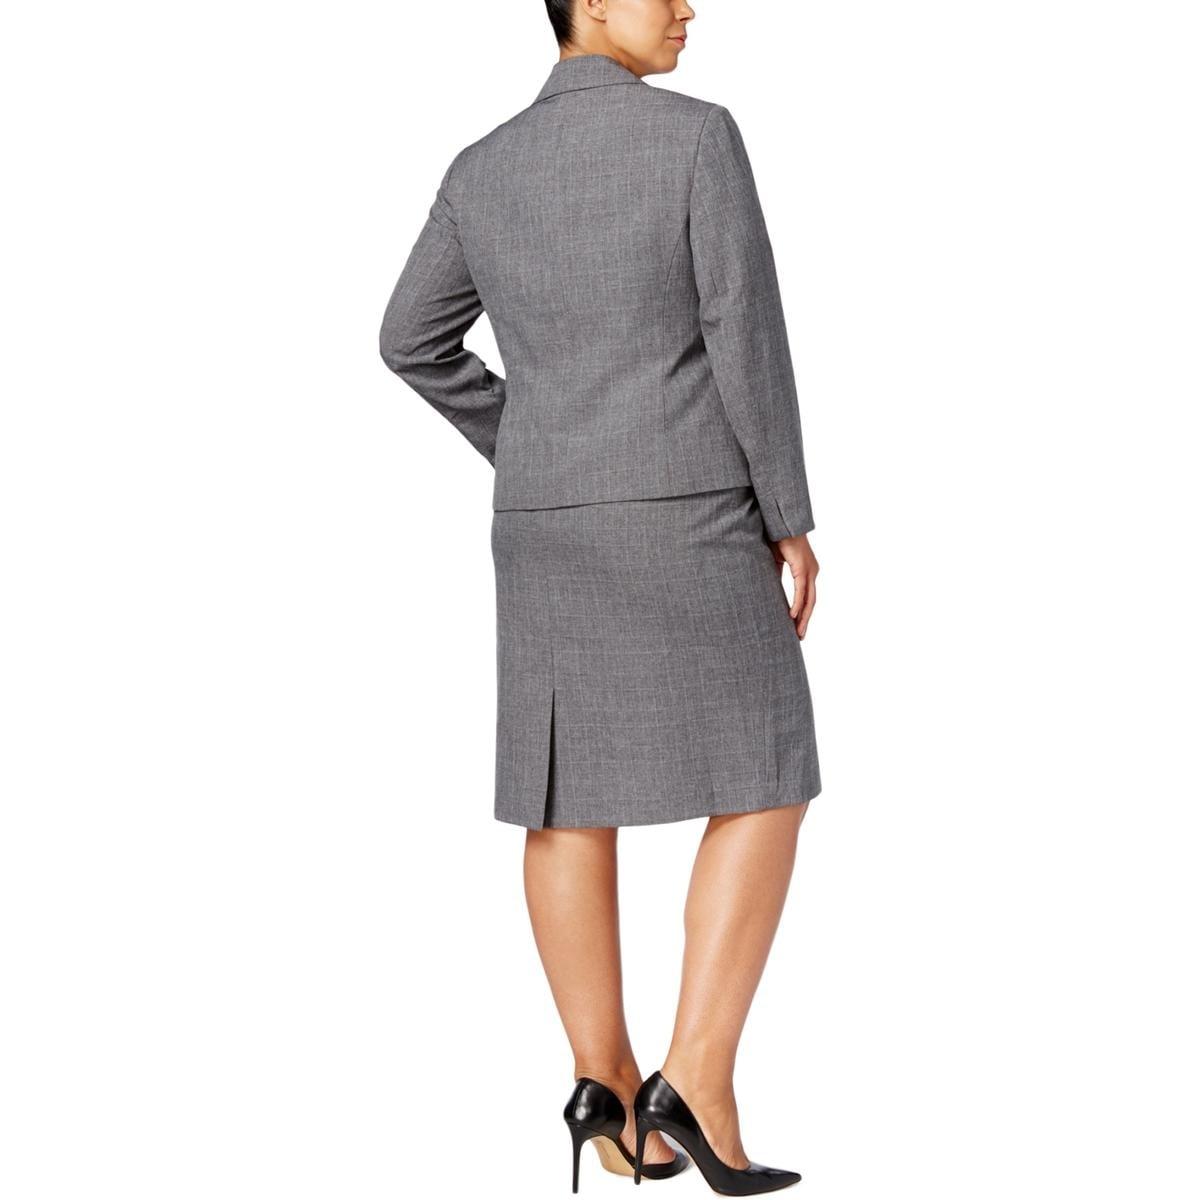 67e6dcc1dd Shop Le Suit Womens Plus Skirt Suit Glen Plaid Professional - Free Shipping  Today - Overstock - 27102756